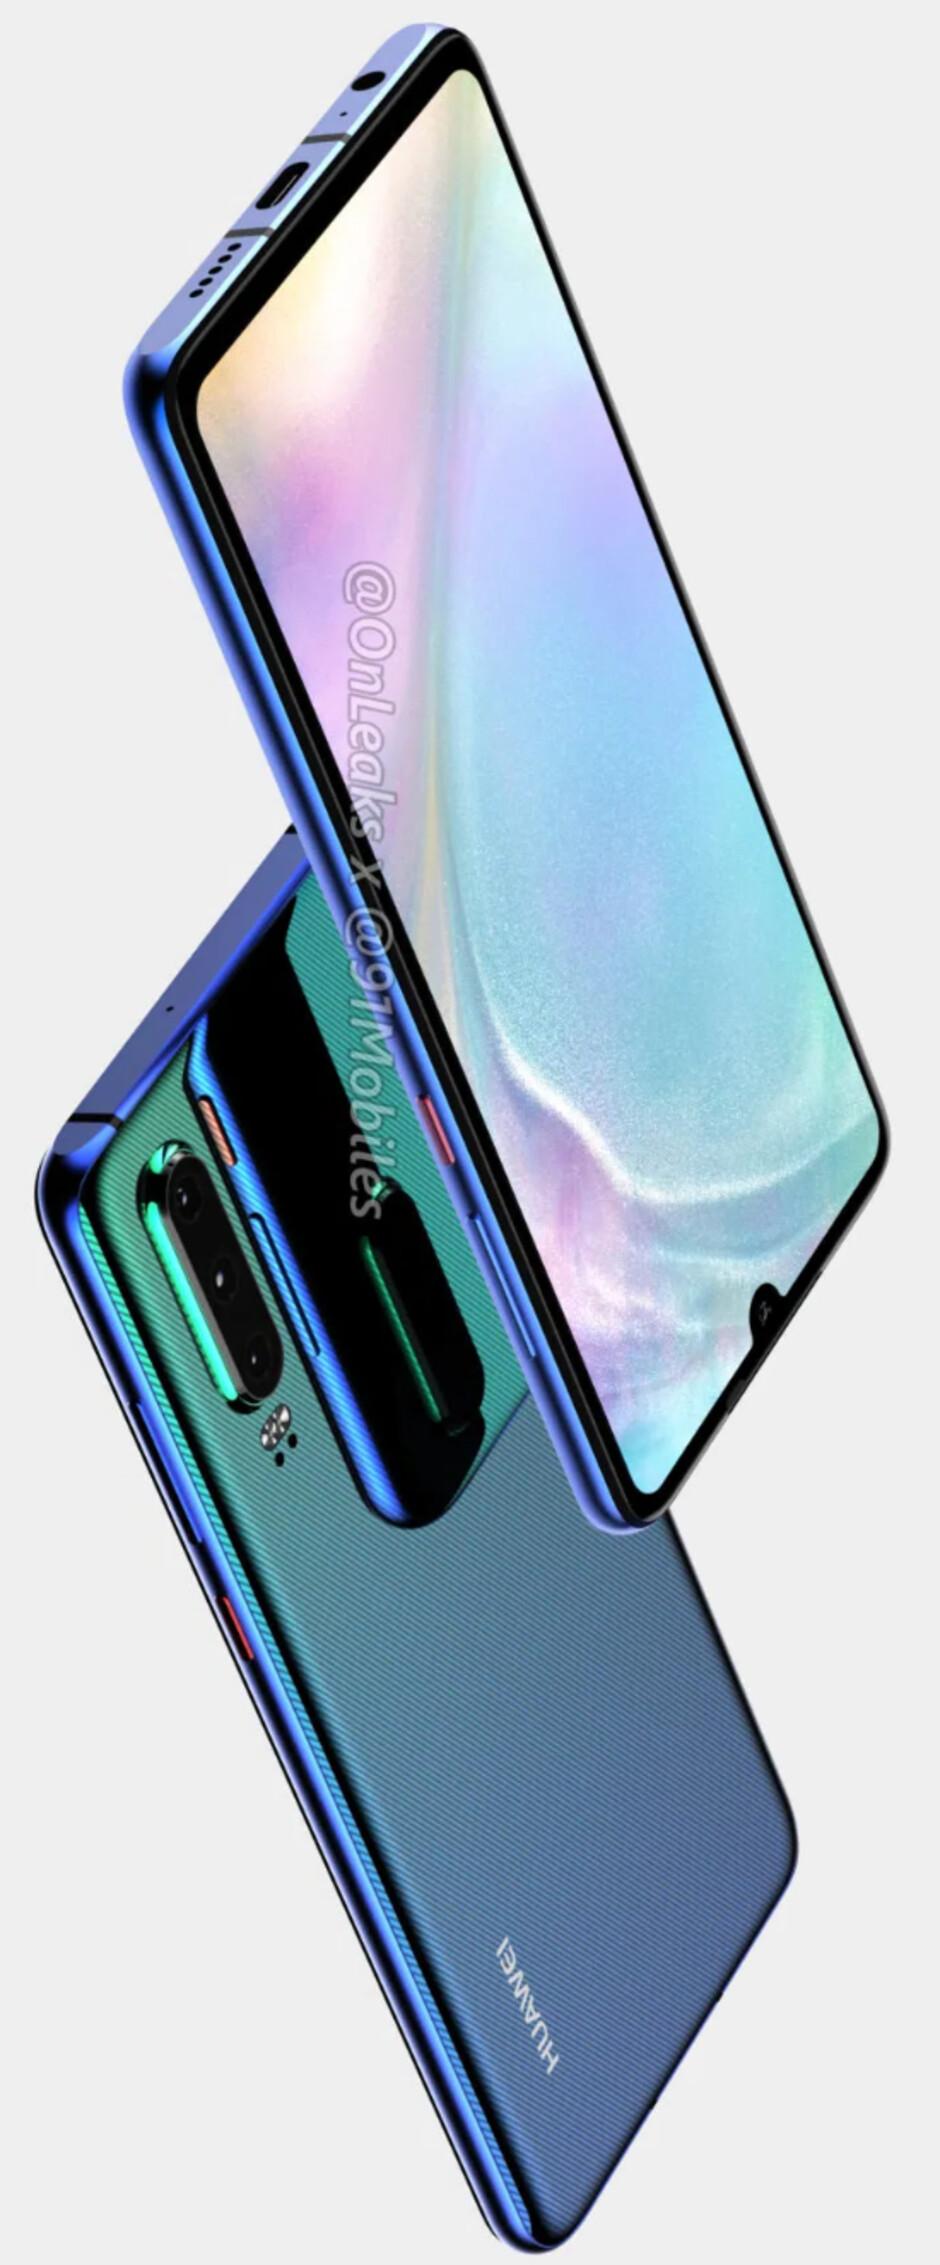 Huawei P30 series leak: big displays, impressive cameras, lots of RAM